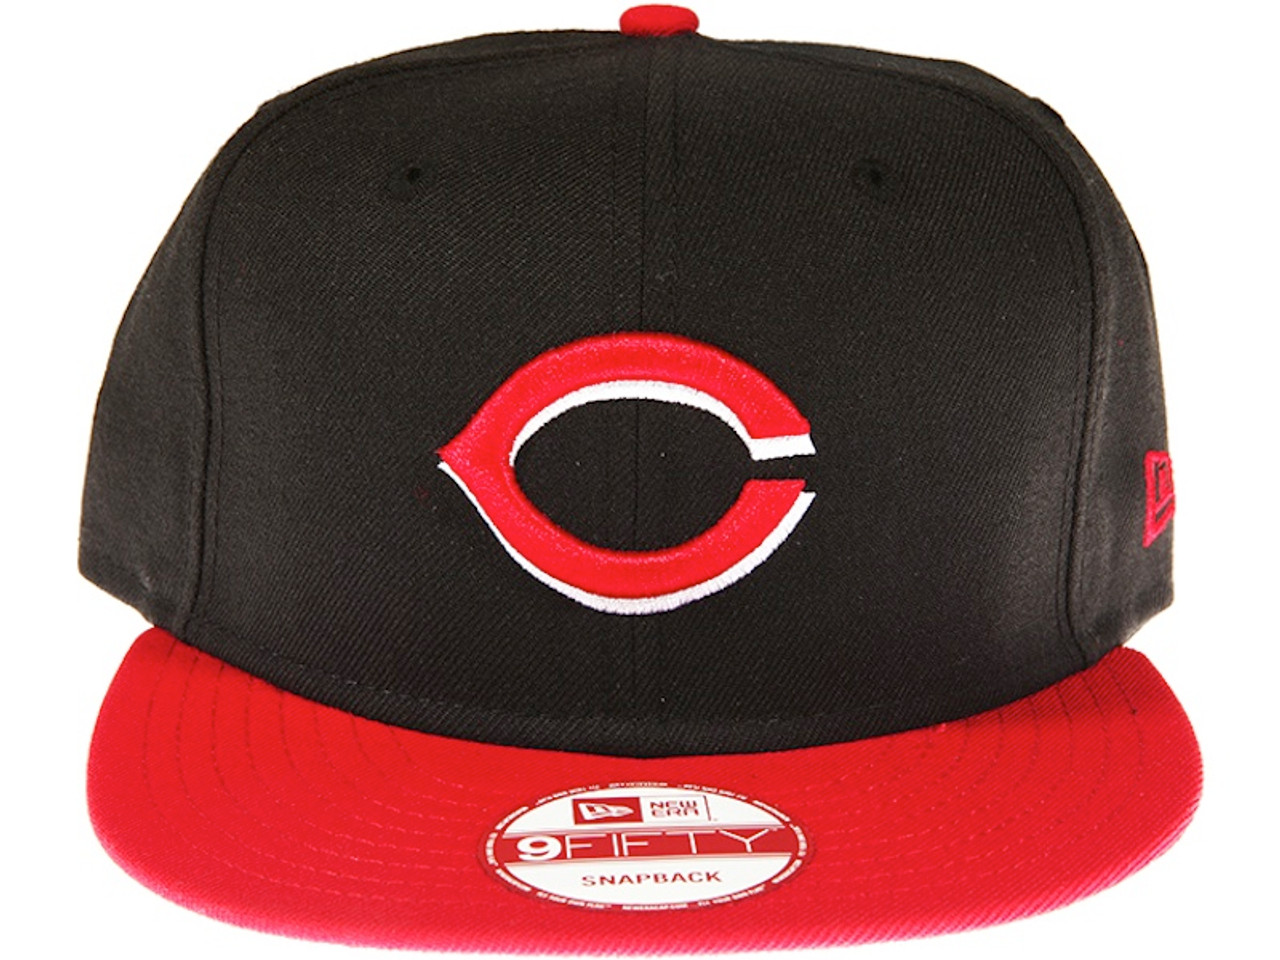 wholesale dealer f664a 11f07 ... 50% off cincinnati reds 2 tone black and red new era 9fifty mlb snapback  hat